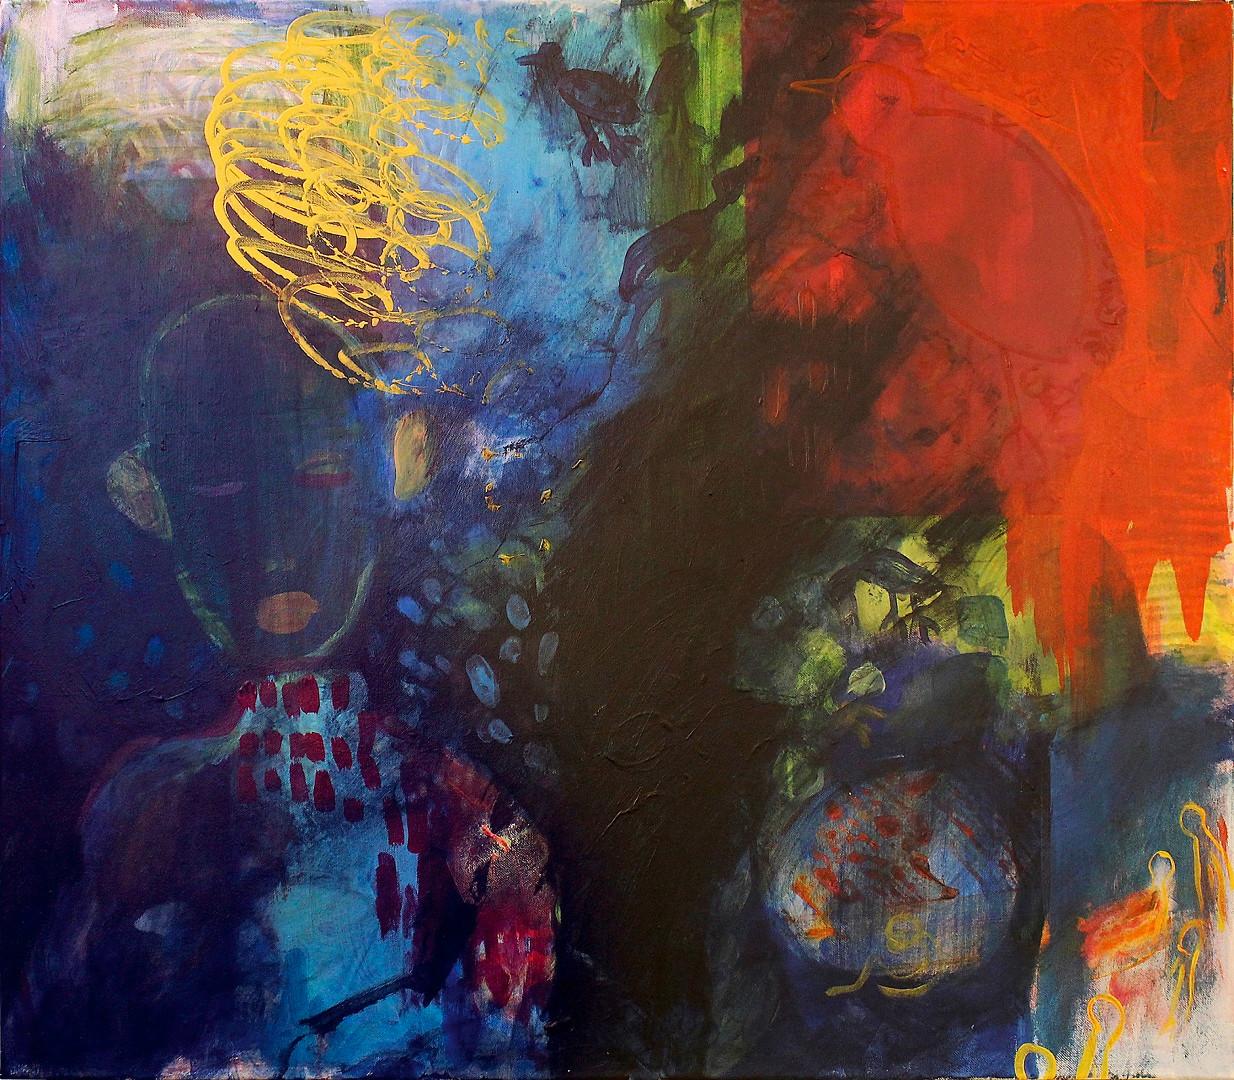 Acryl auf Leinwand. 70x100 cm  2013, © Christa Redik